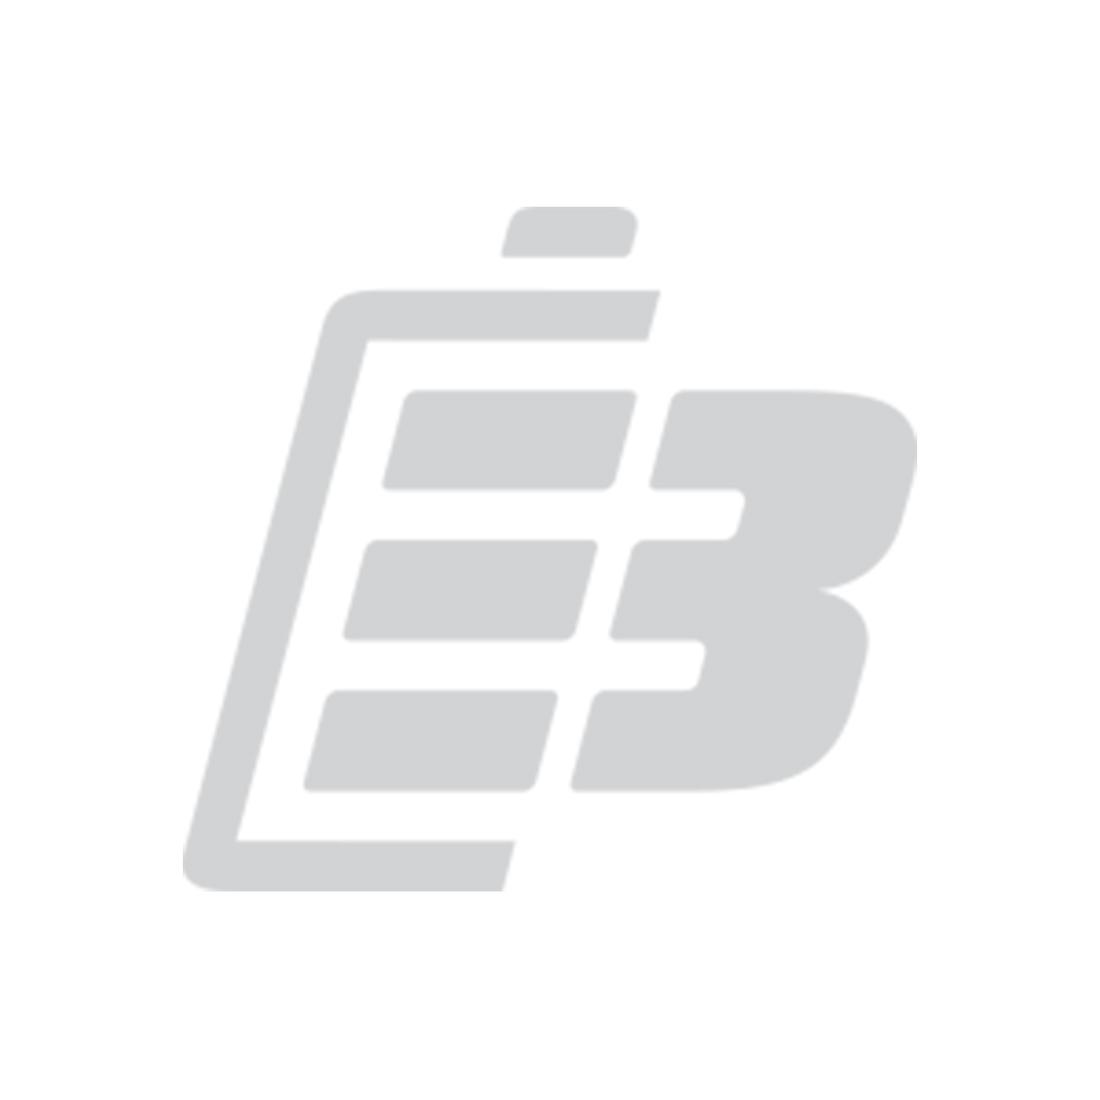 Fenix ALF-18 18650 to 21700 Battery Adapter